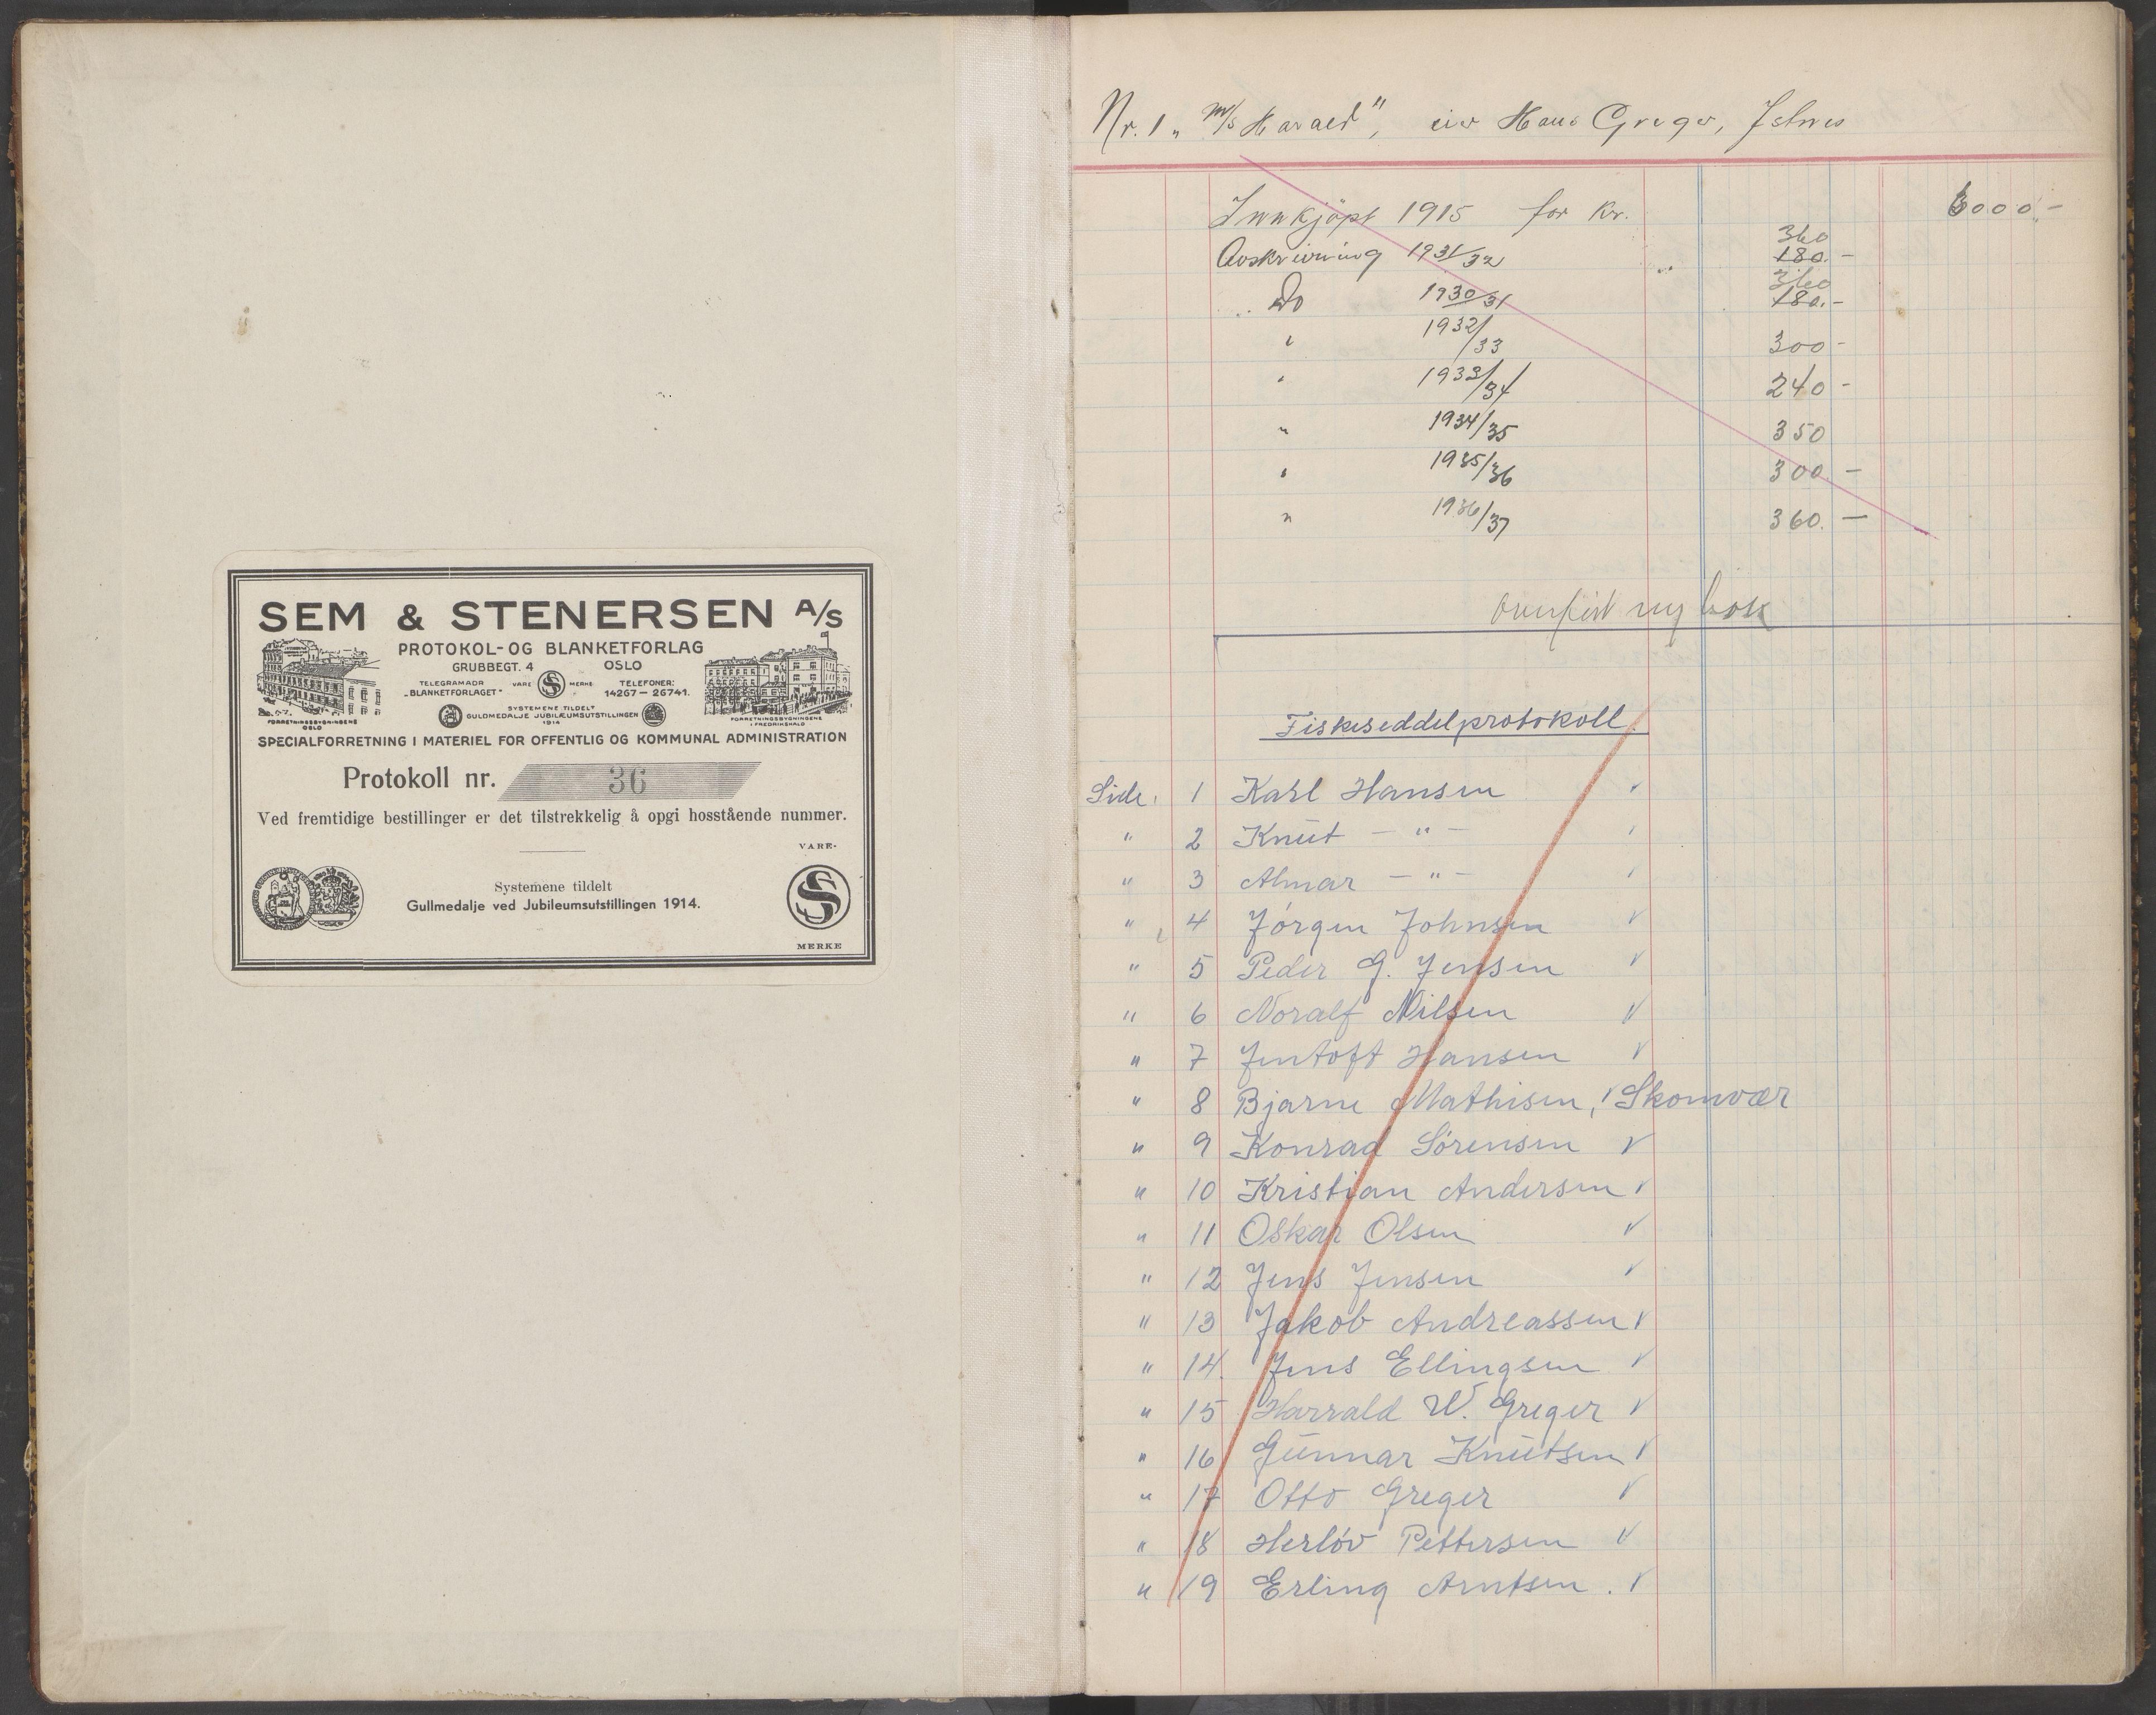 AIN, Røst ligningsnemnd fiskeseddelprotokoll 1915 - 1955, 1915-1955